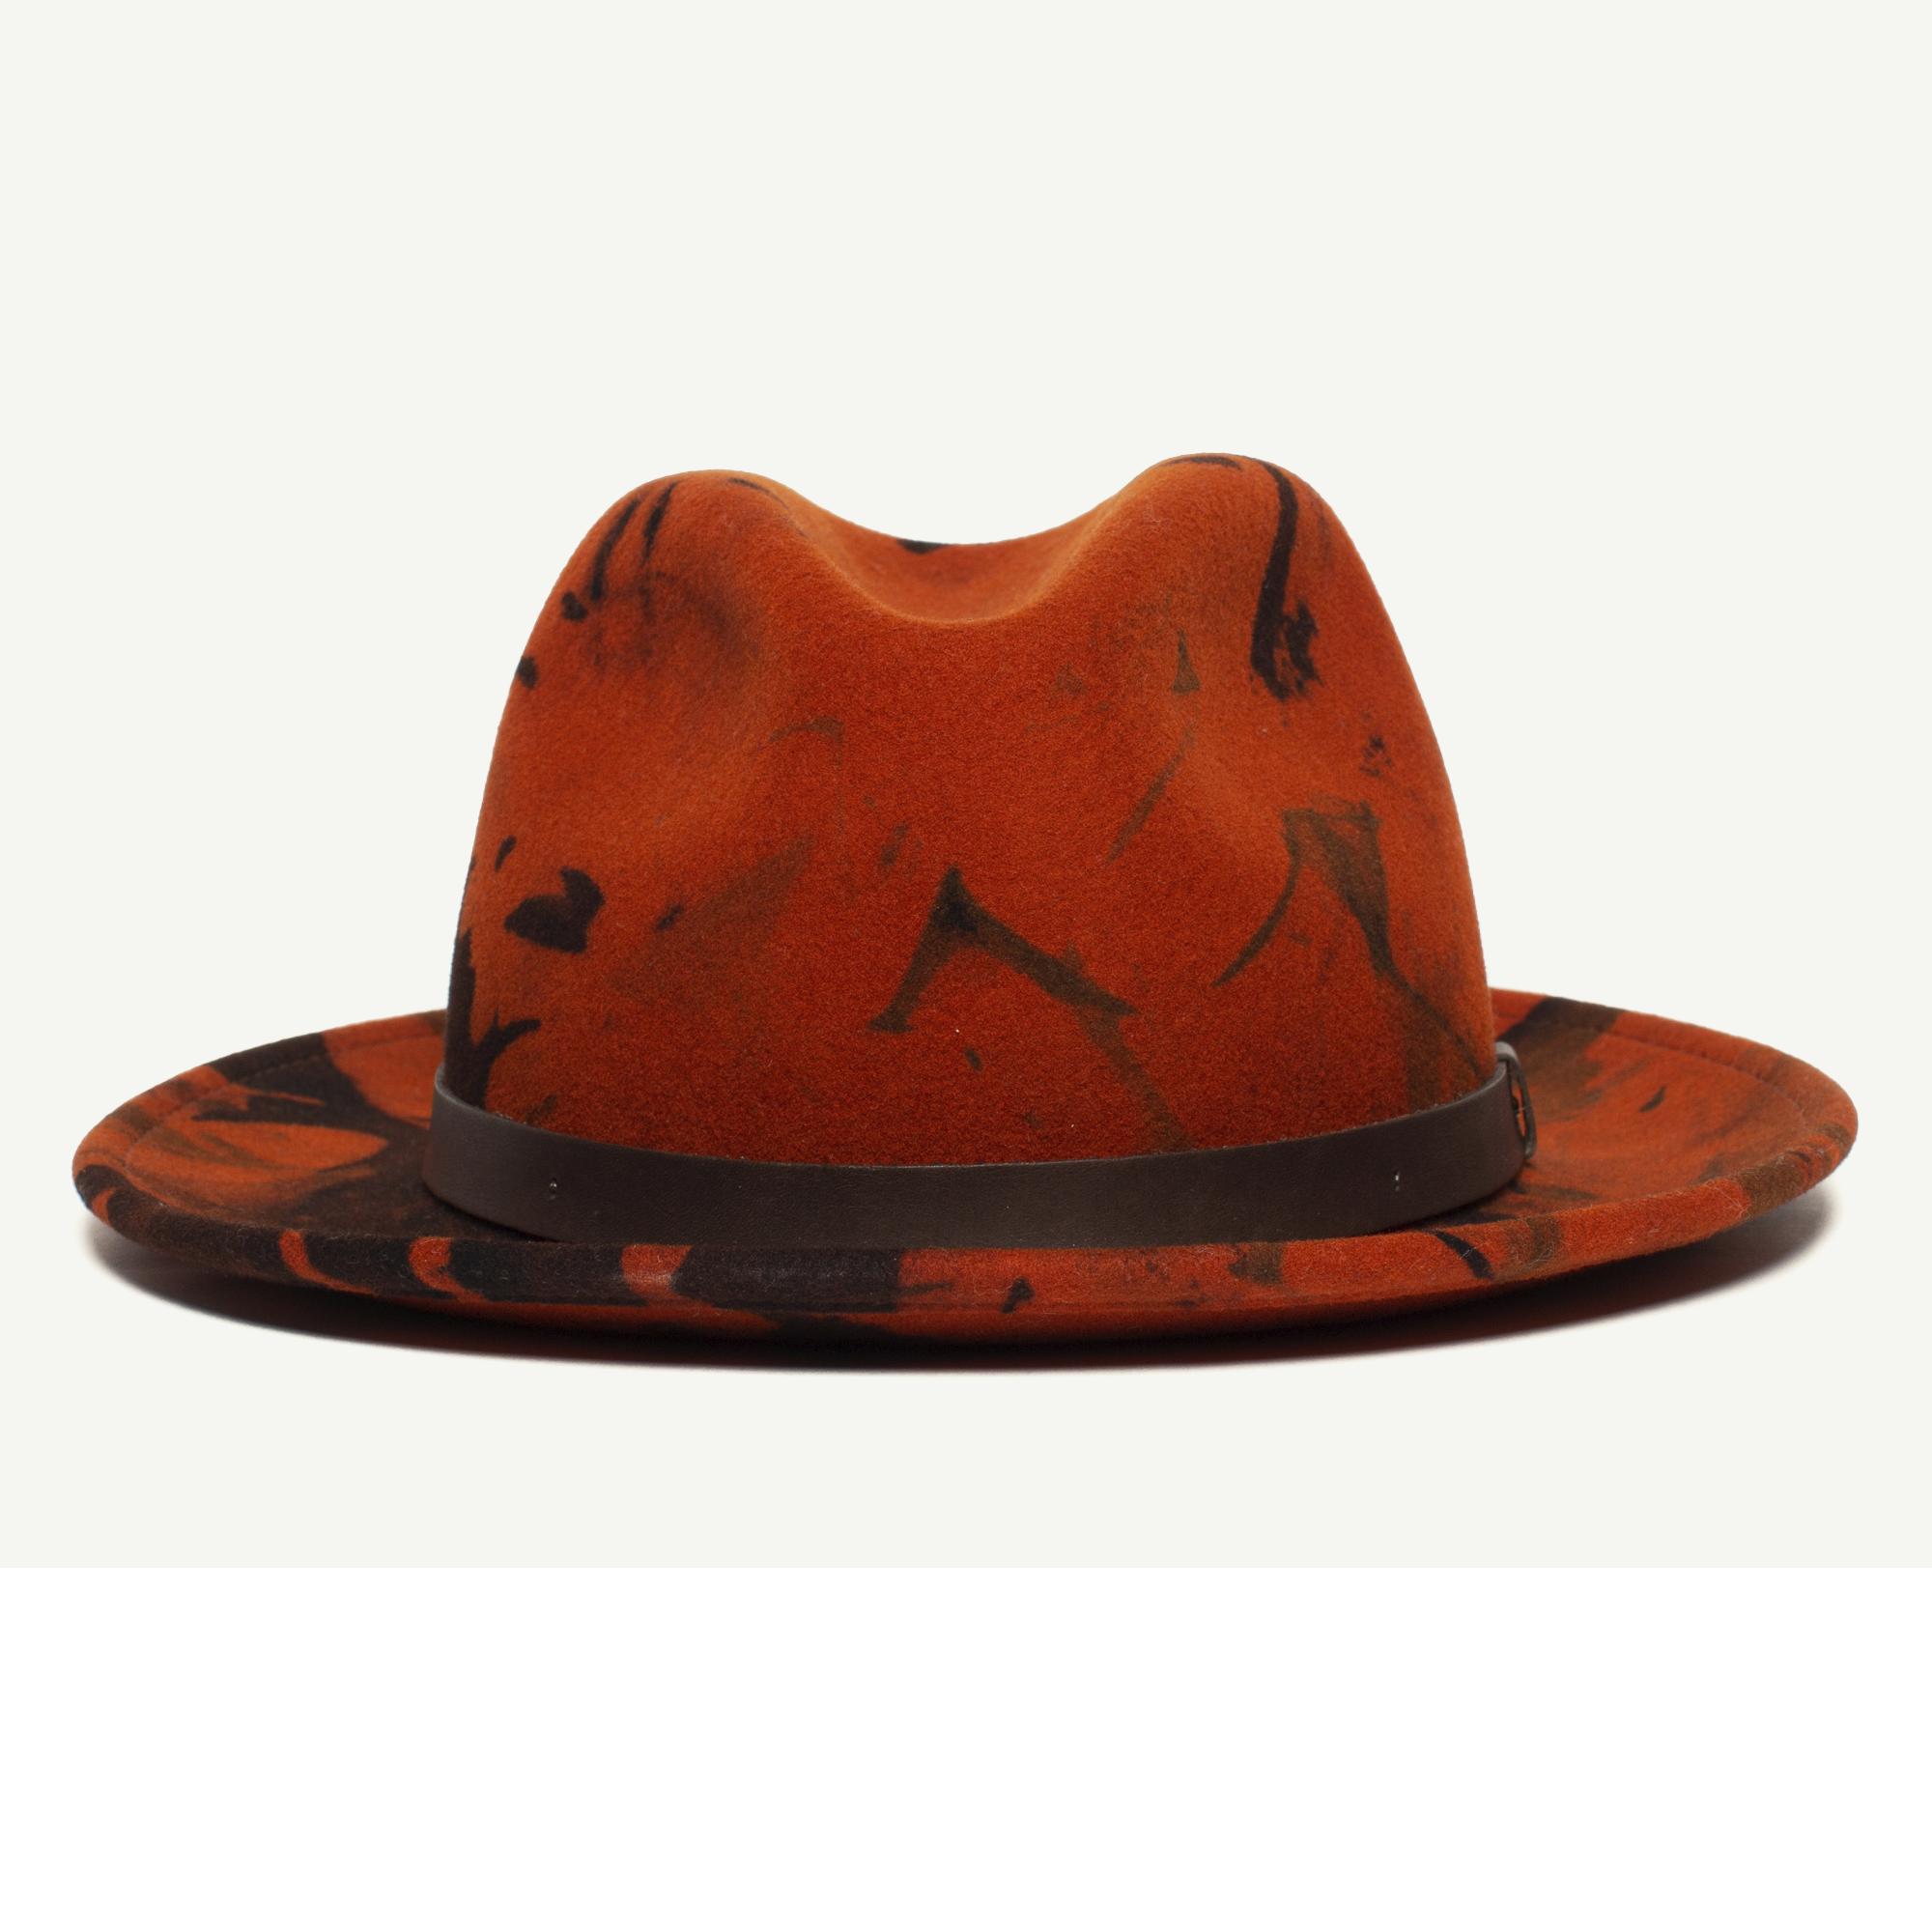 435da848e3808f Dean The Butcher Pumpkin Wool Fedora Hat | Goorin Bros. Hat Shop ...